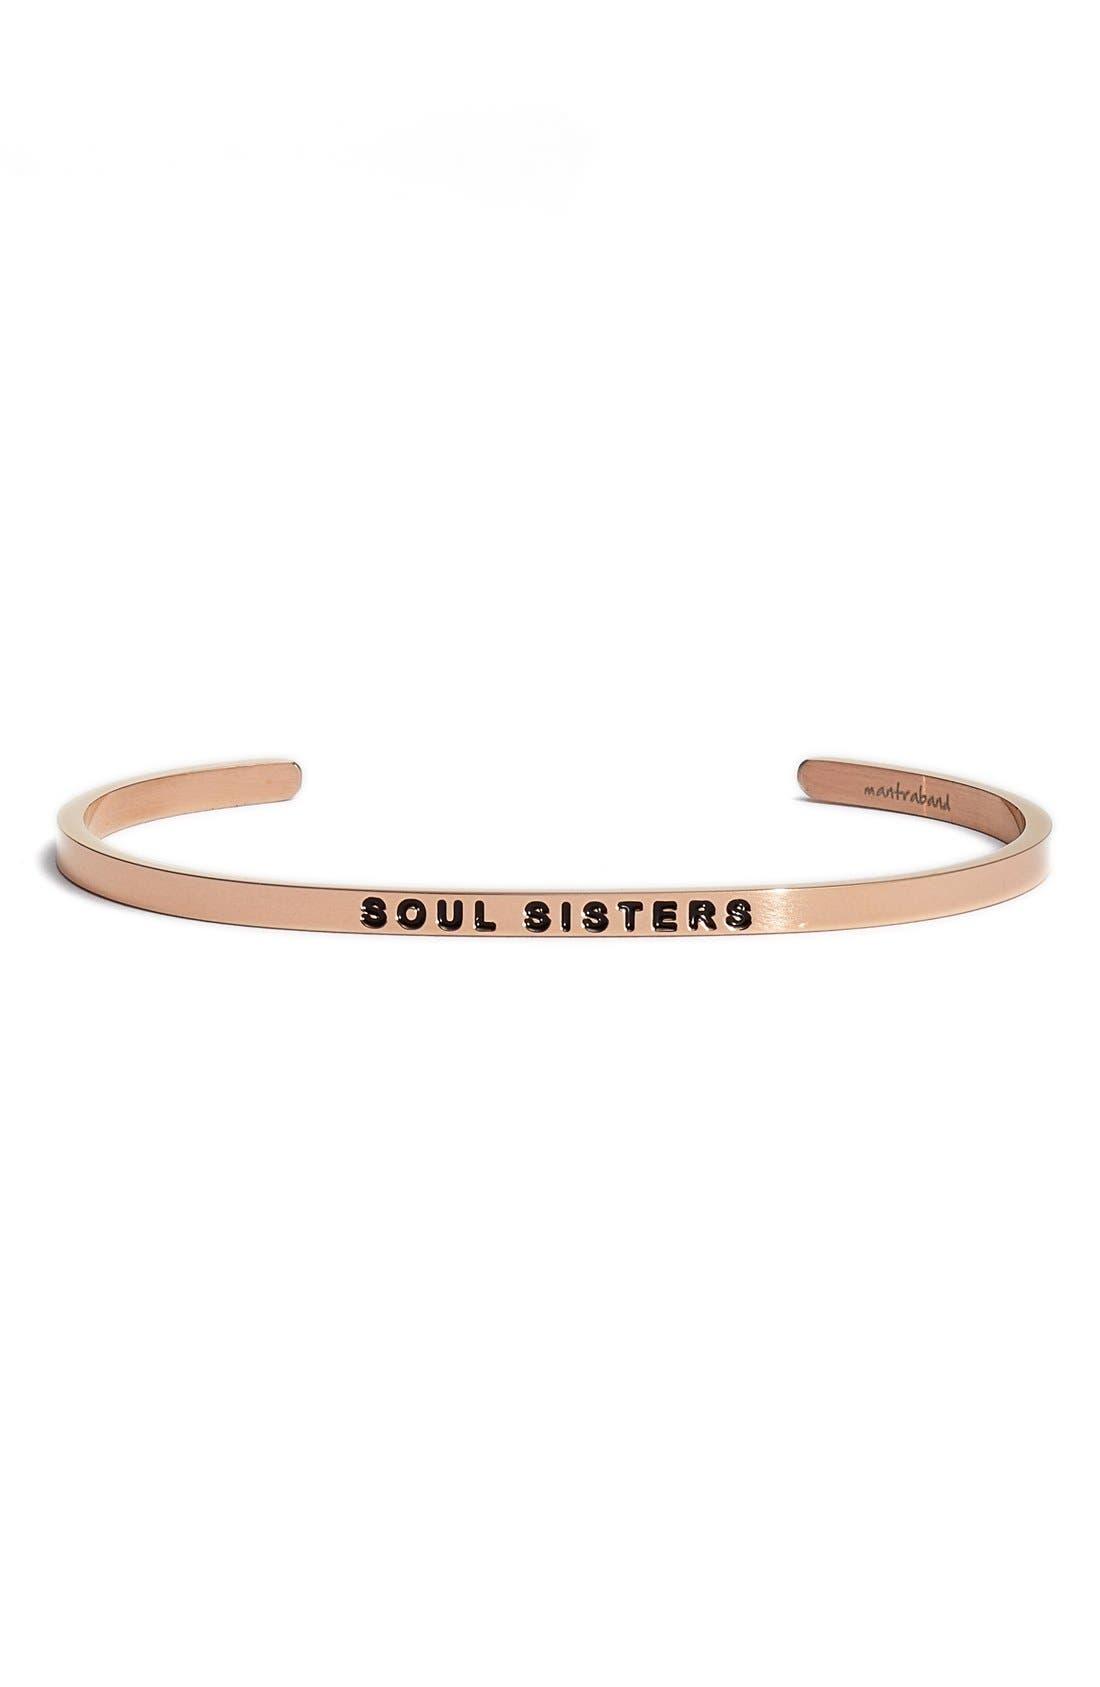 MANTRABAND Soul Sister Cuff